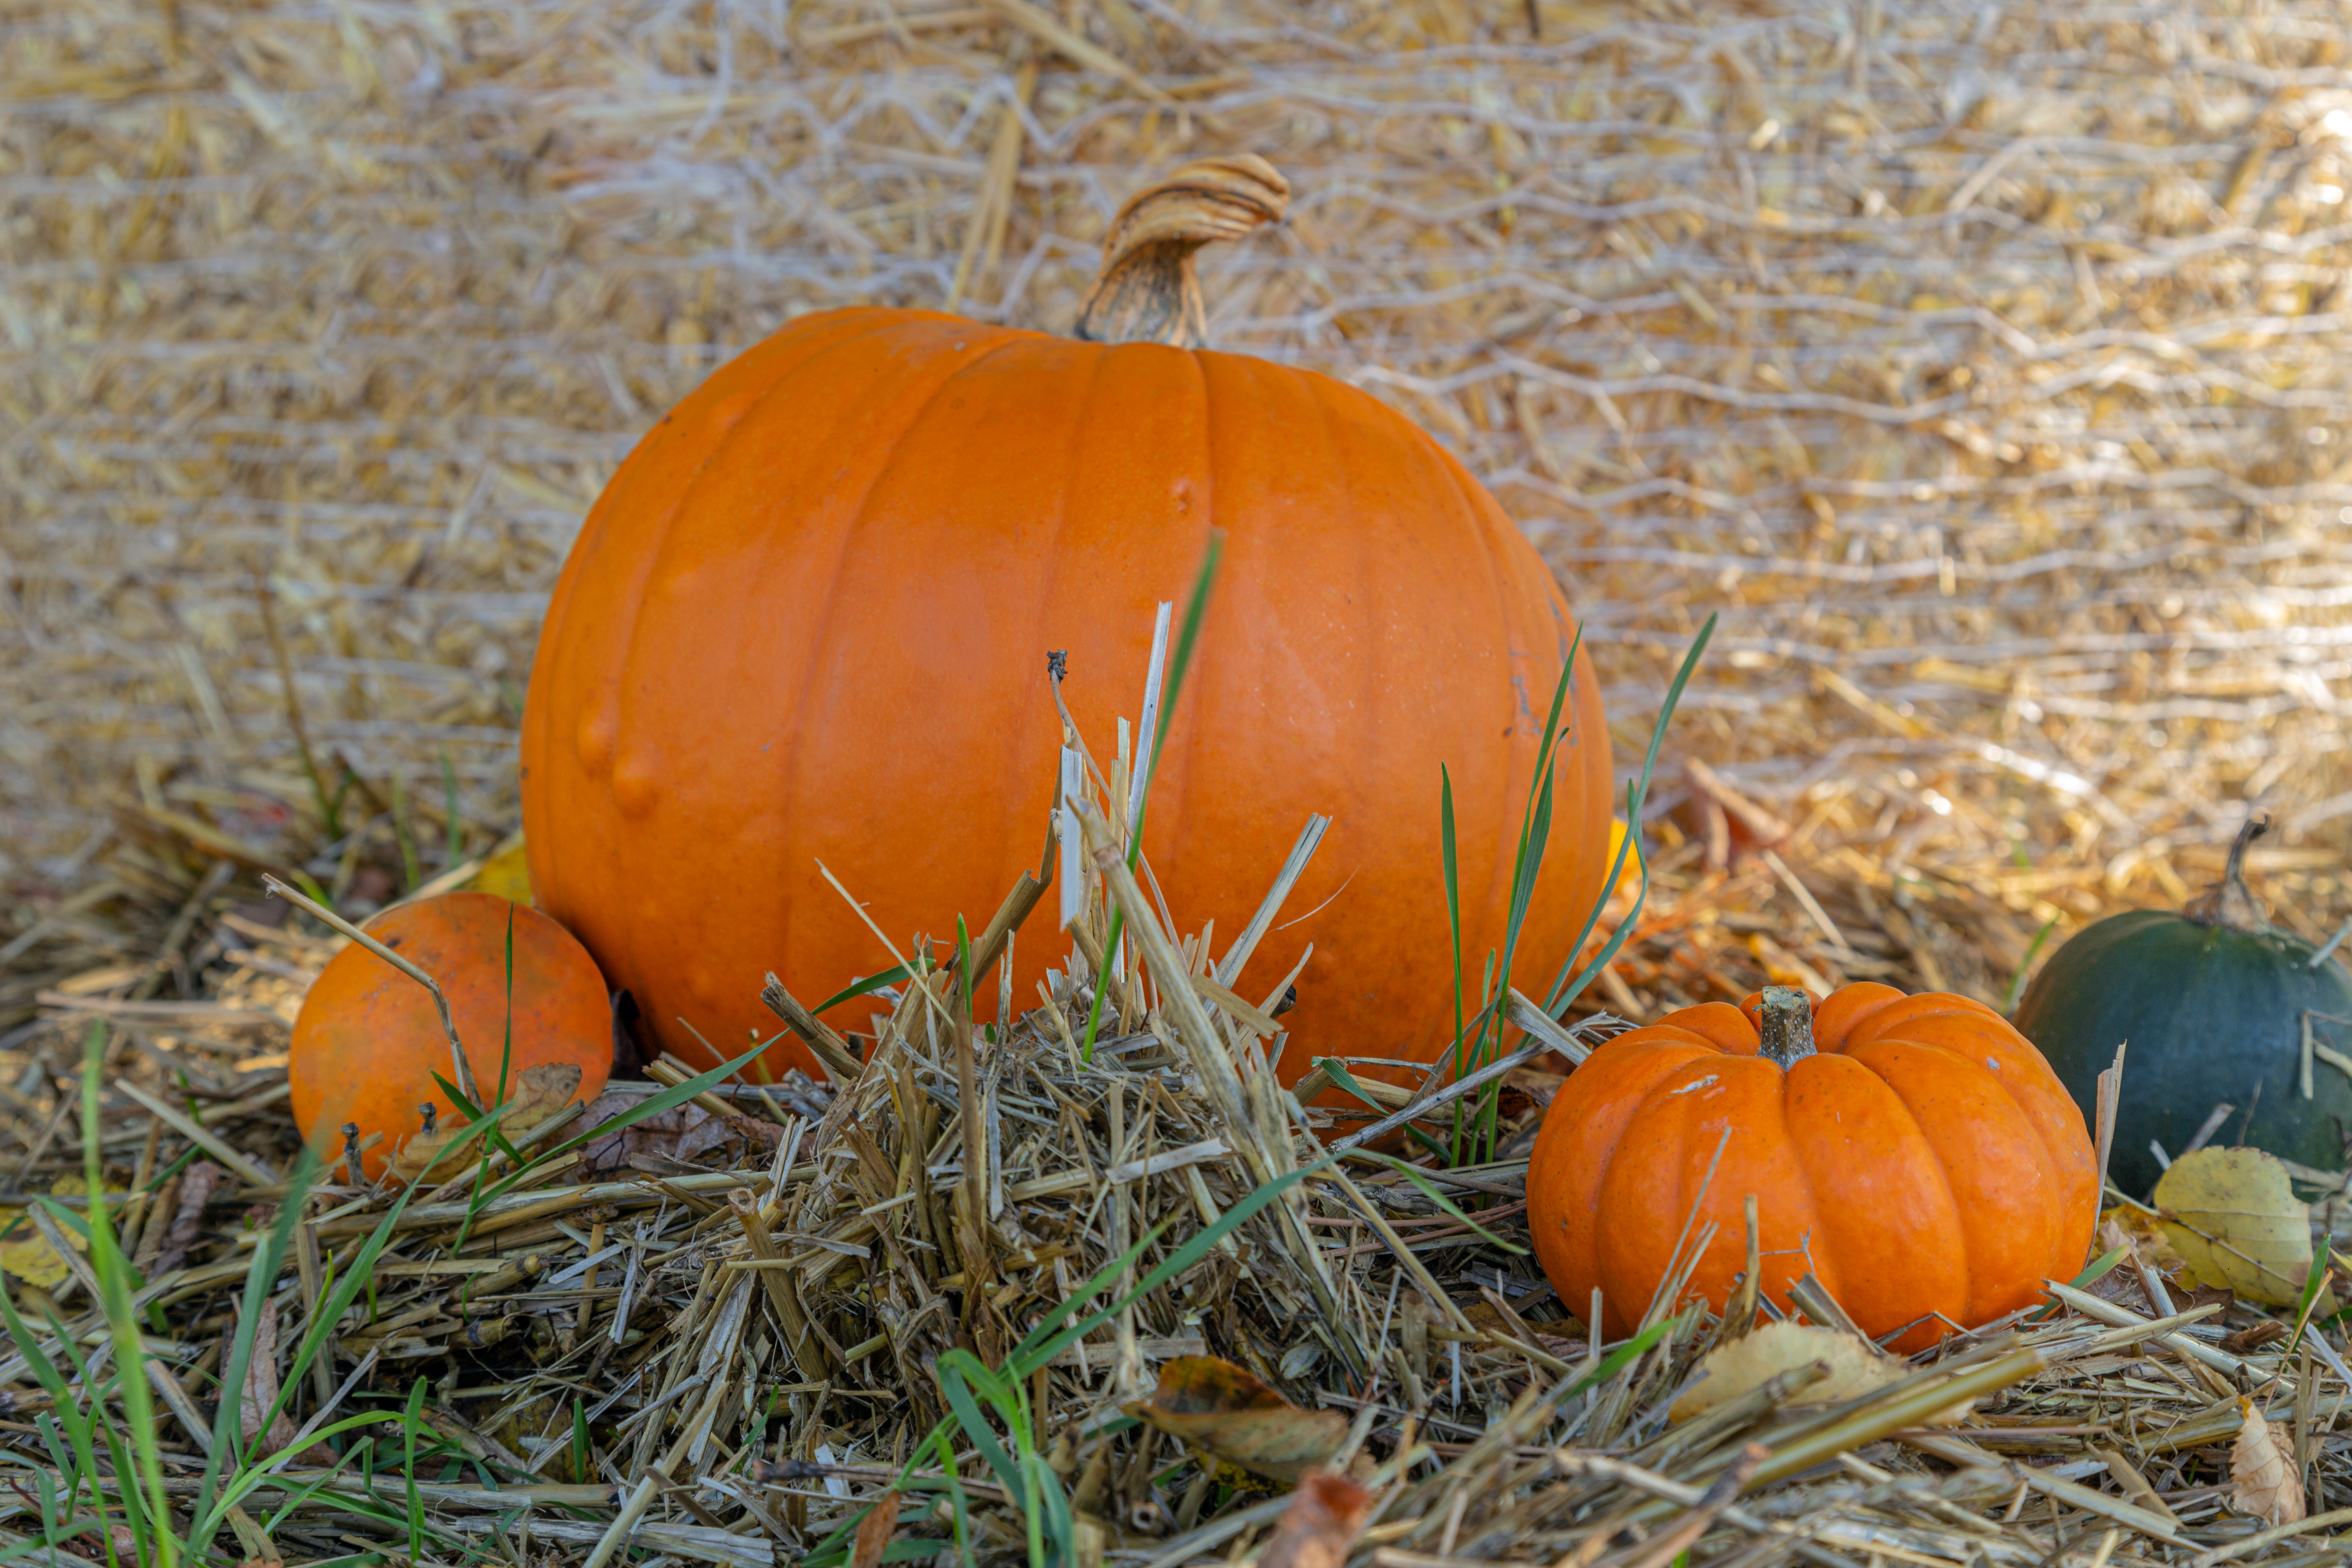 a large pumpkin sits in a field